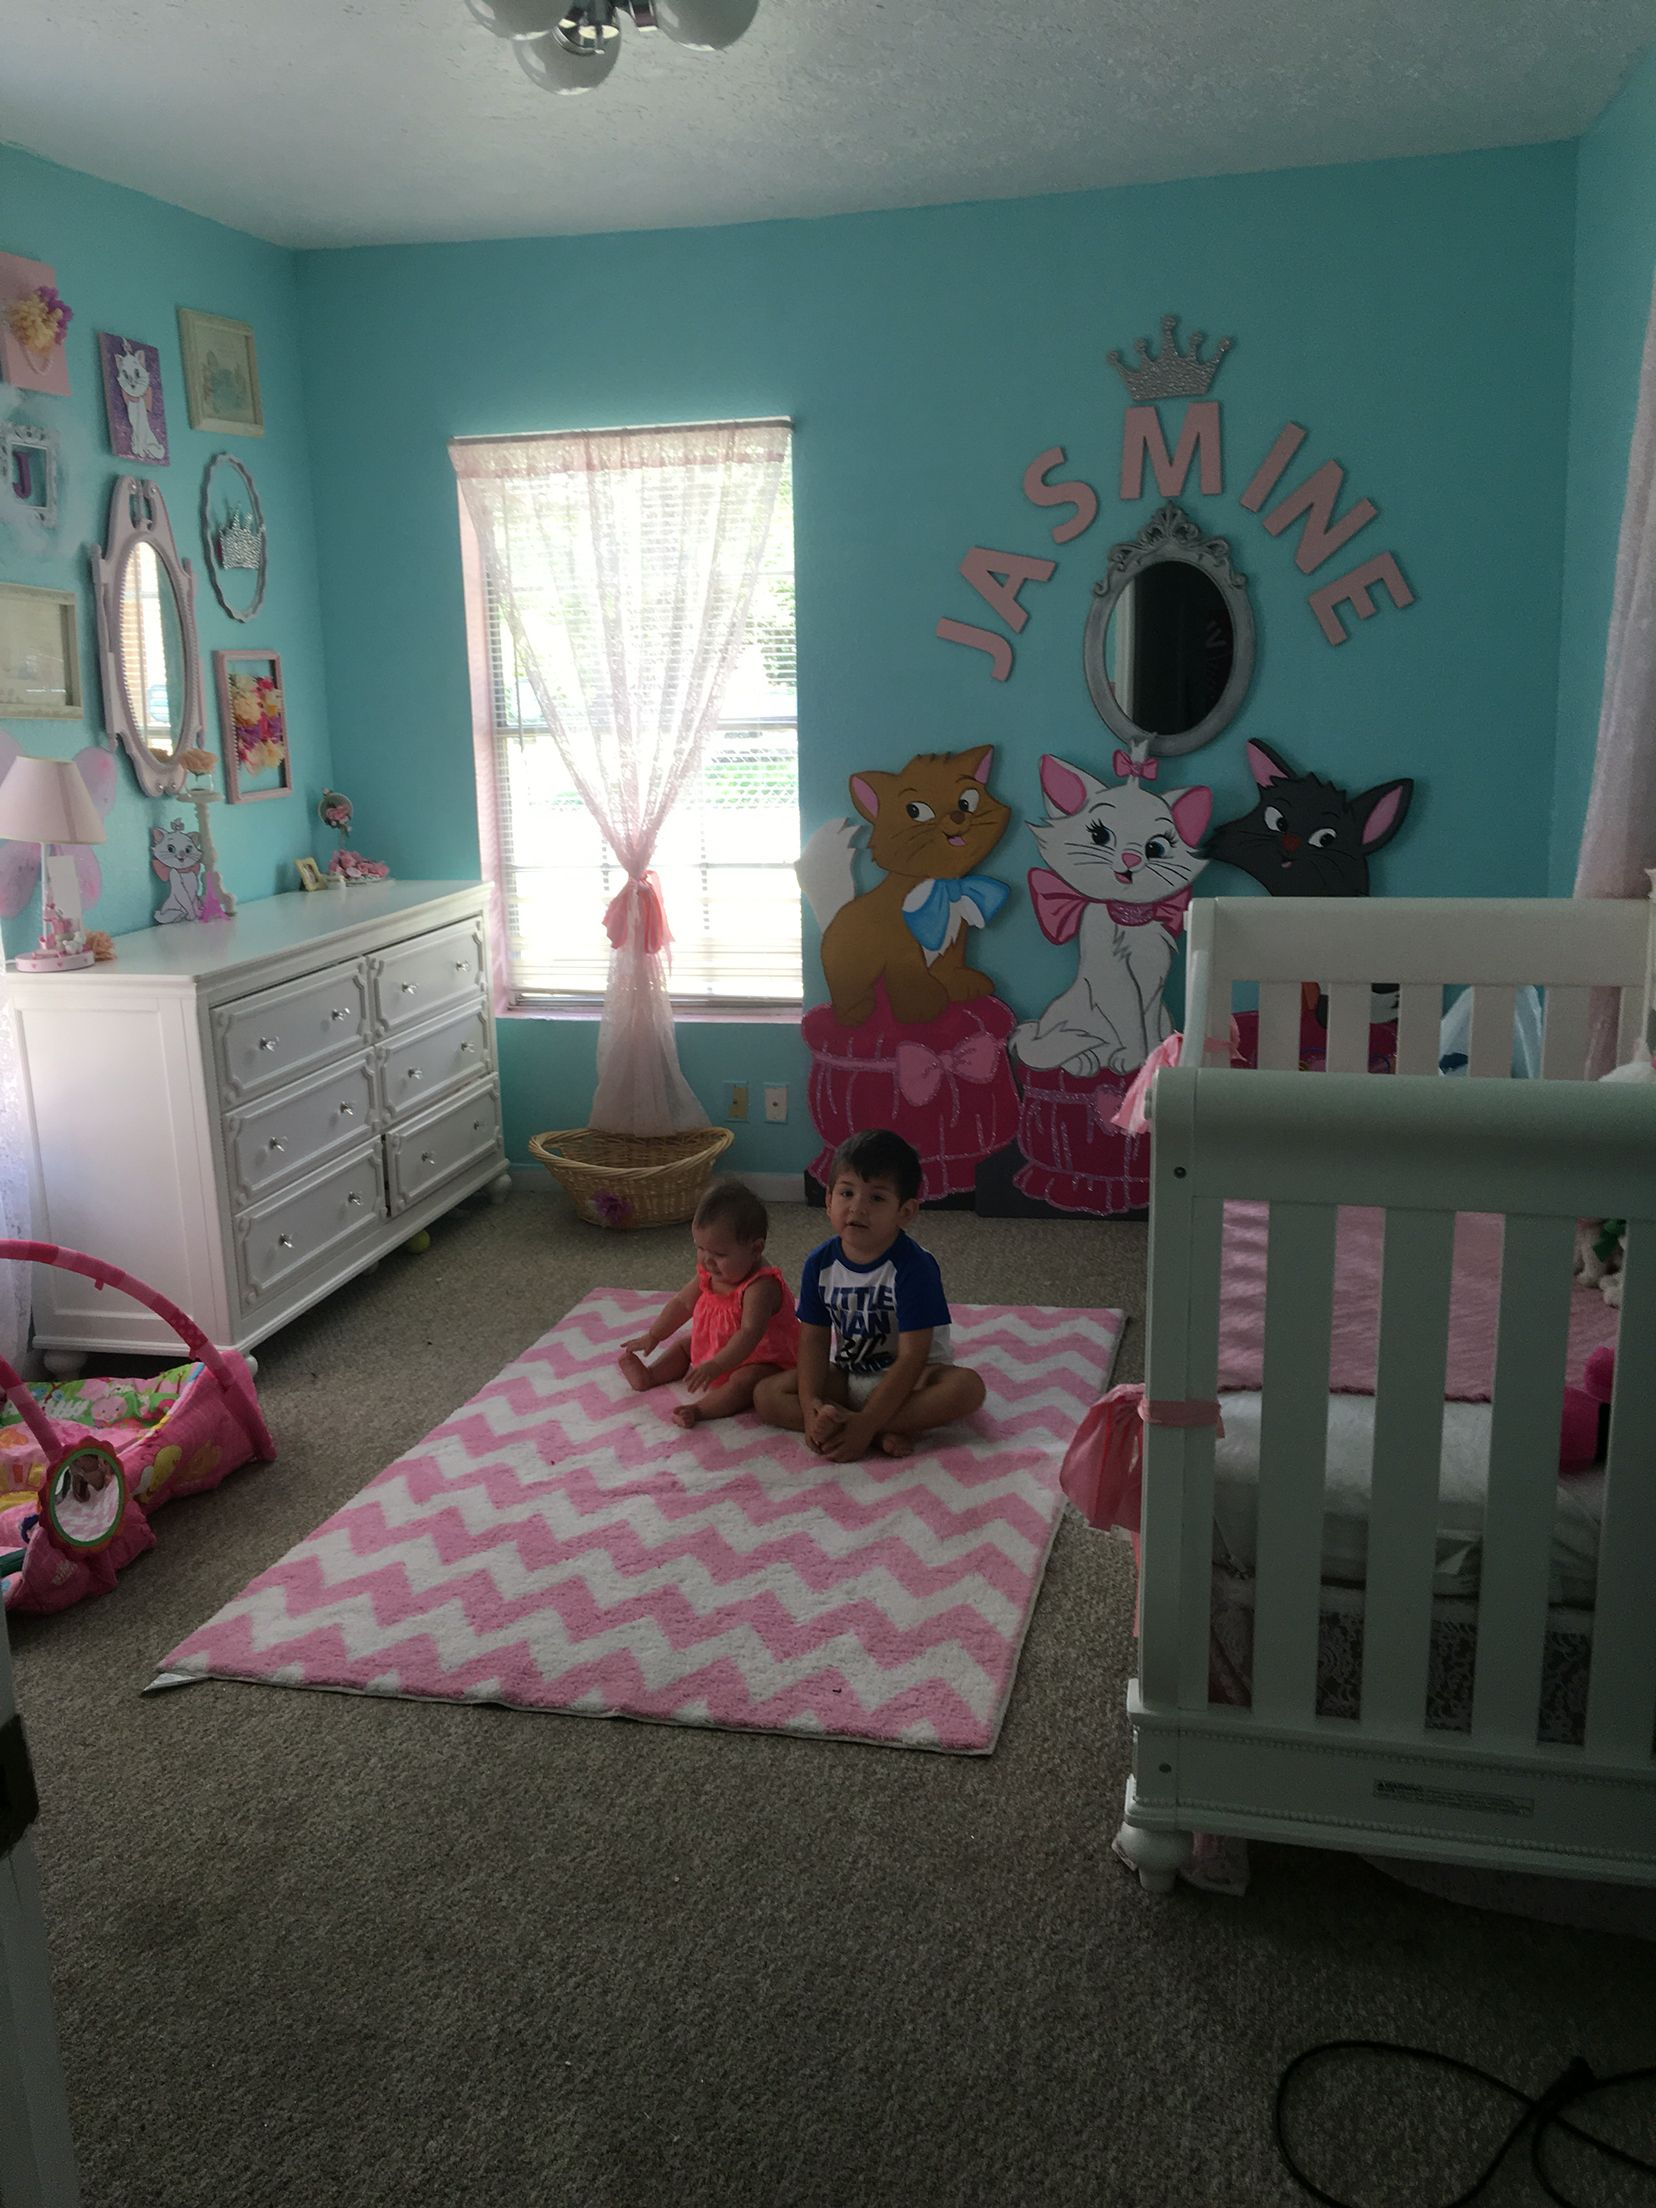 Diy Marie room Disney aristocratics room | Aristocats Marie room ...